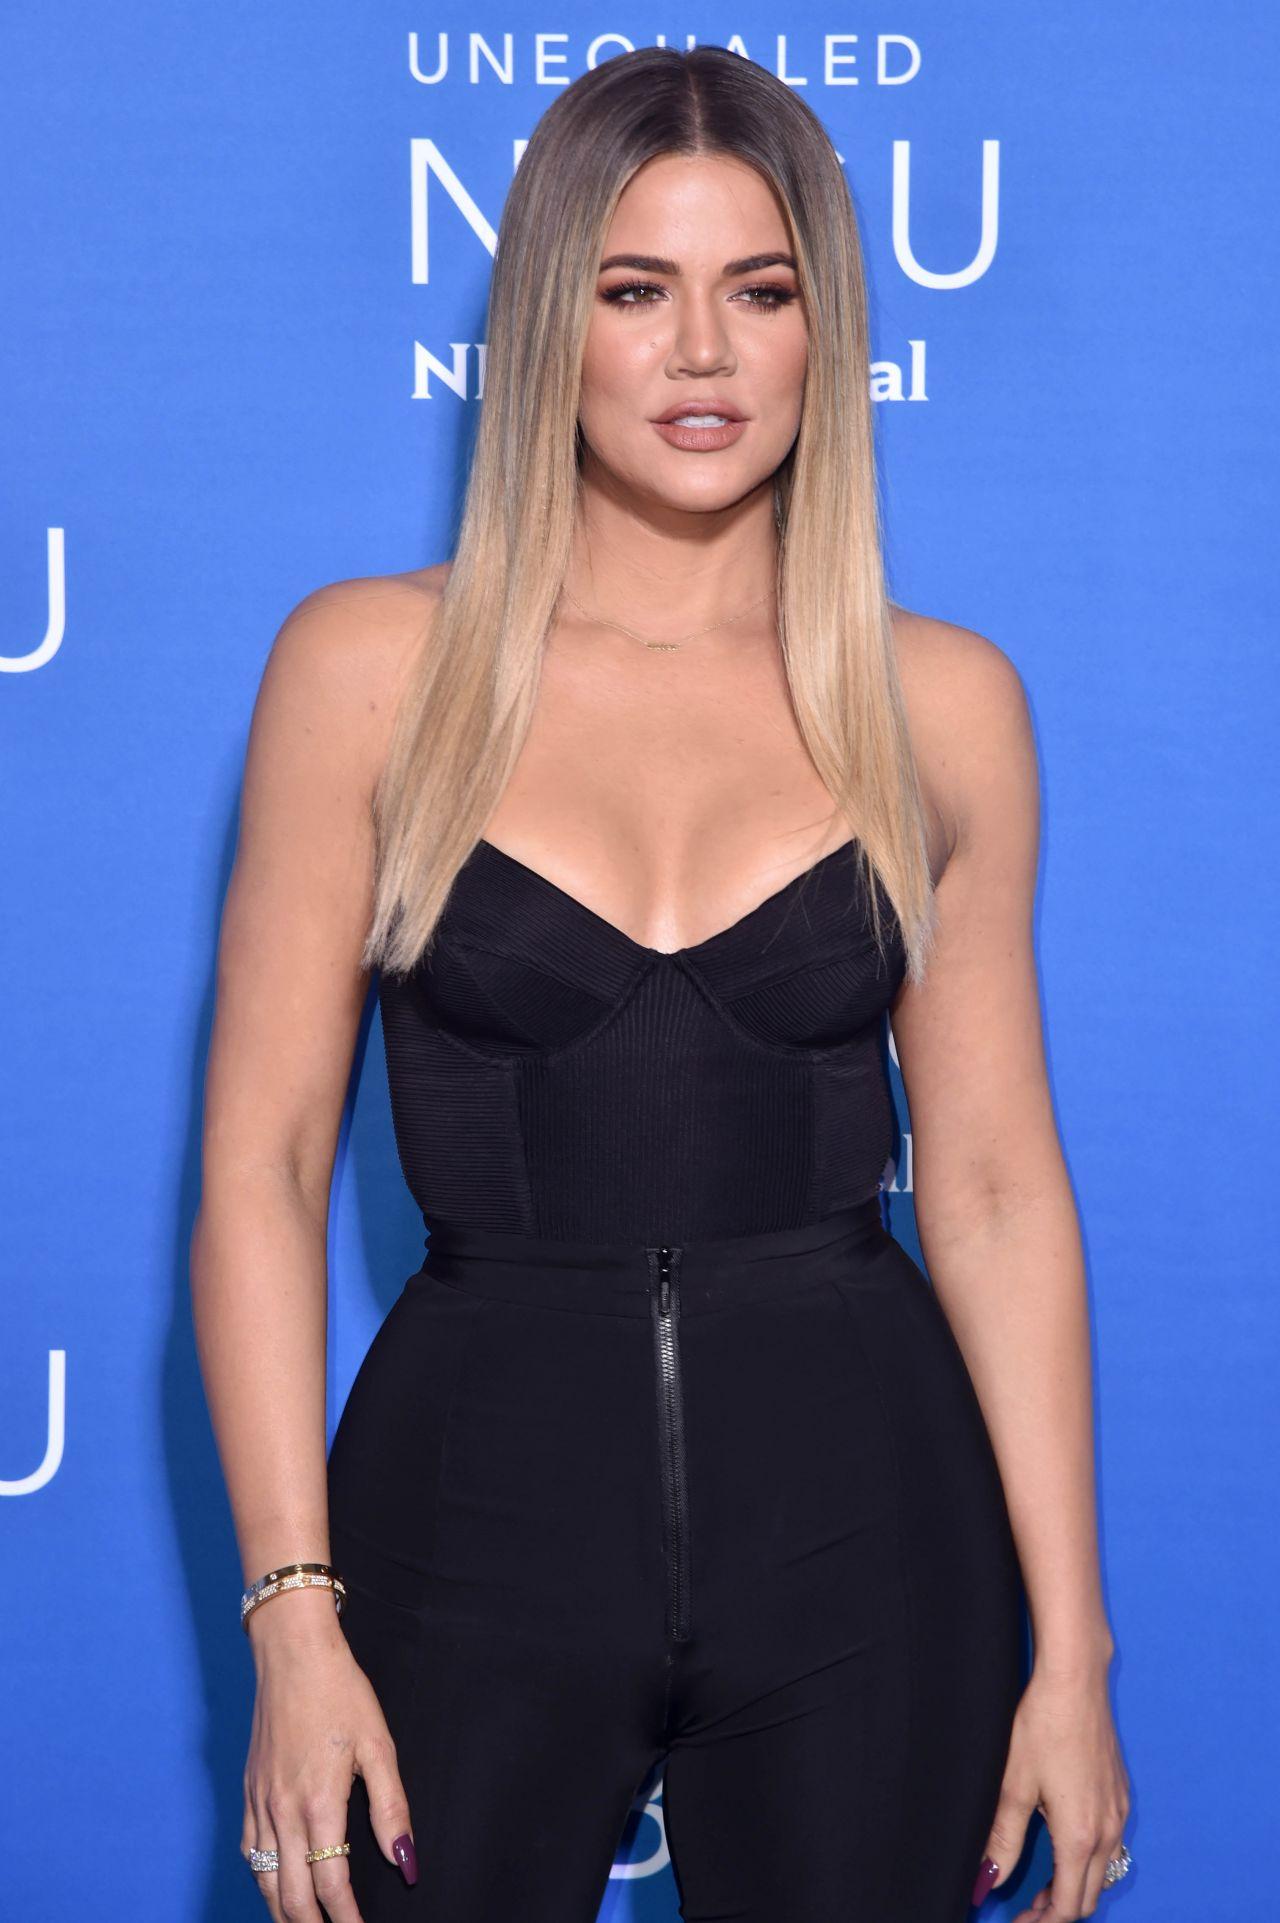 Khloe Kardashian NBCUniversal Upfront In NYC 05 15 2017